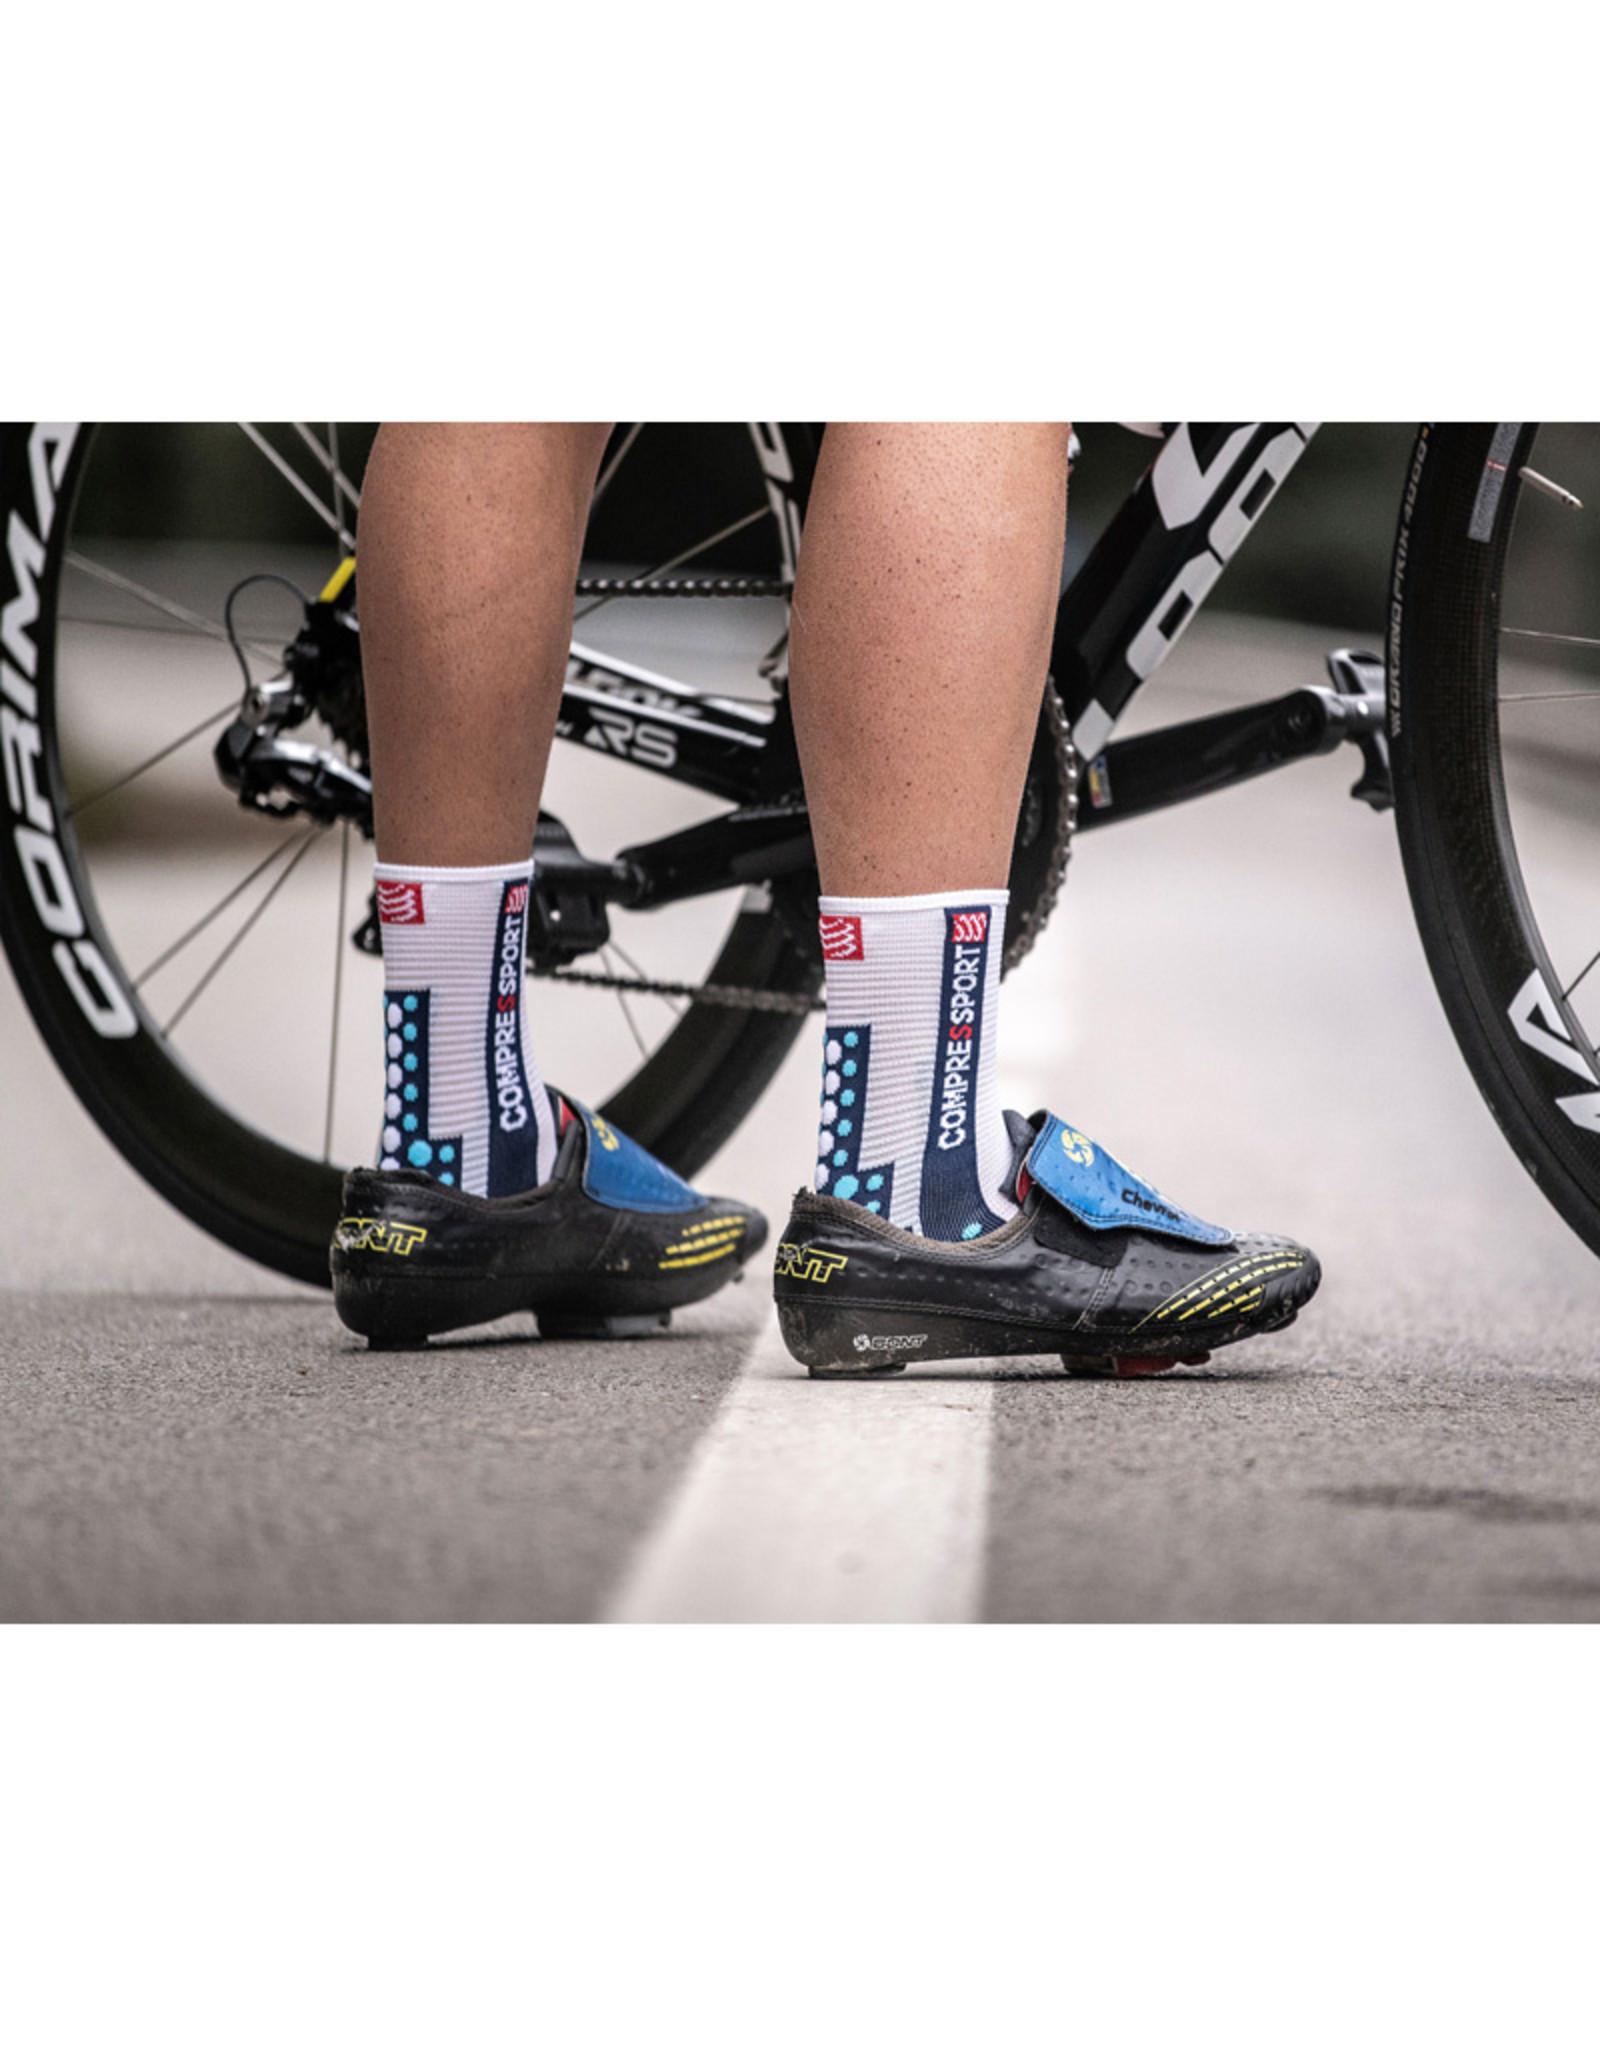 Compressport Pro Racing Socks V3.0 Bike Fietssokken - Wit/Blauw